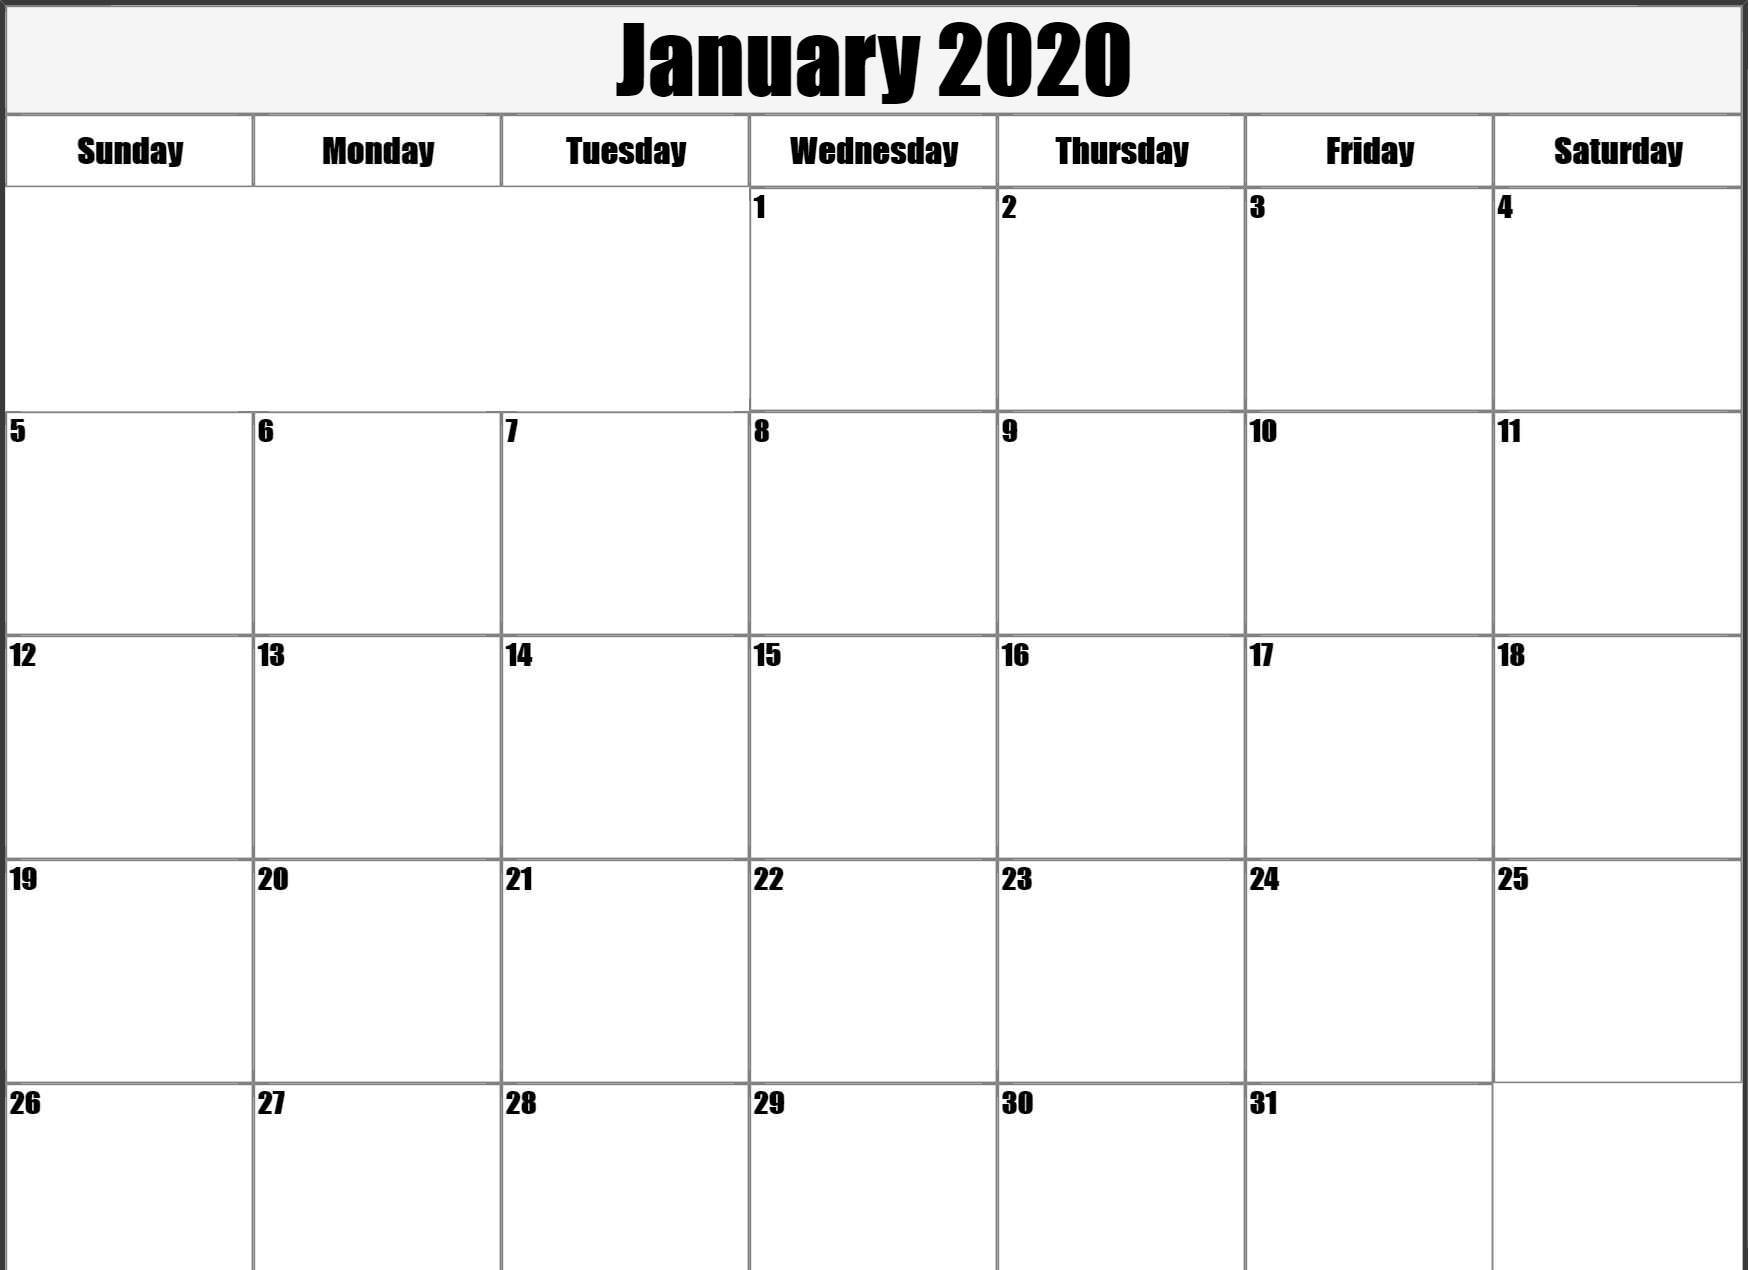 January 2020 Blank Calendar Printable